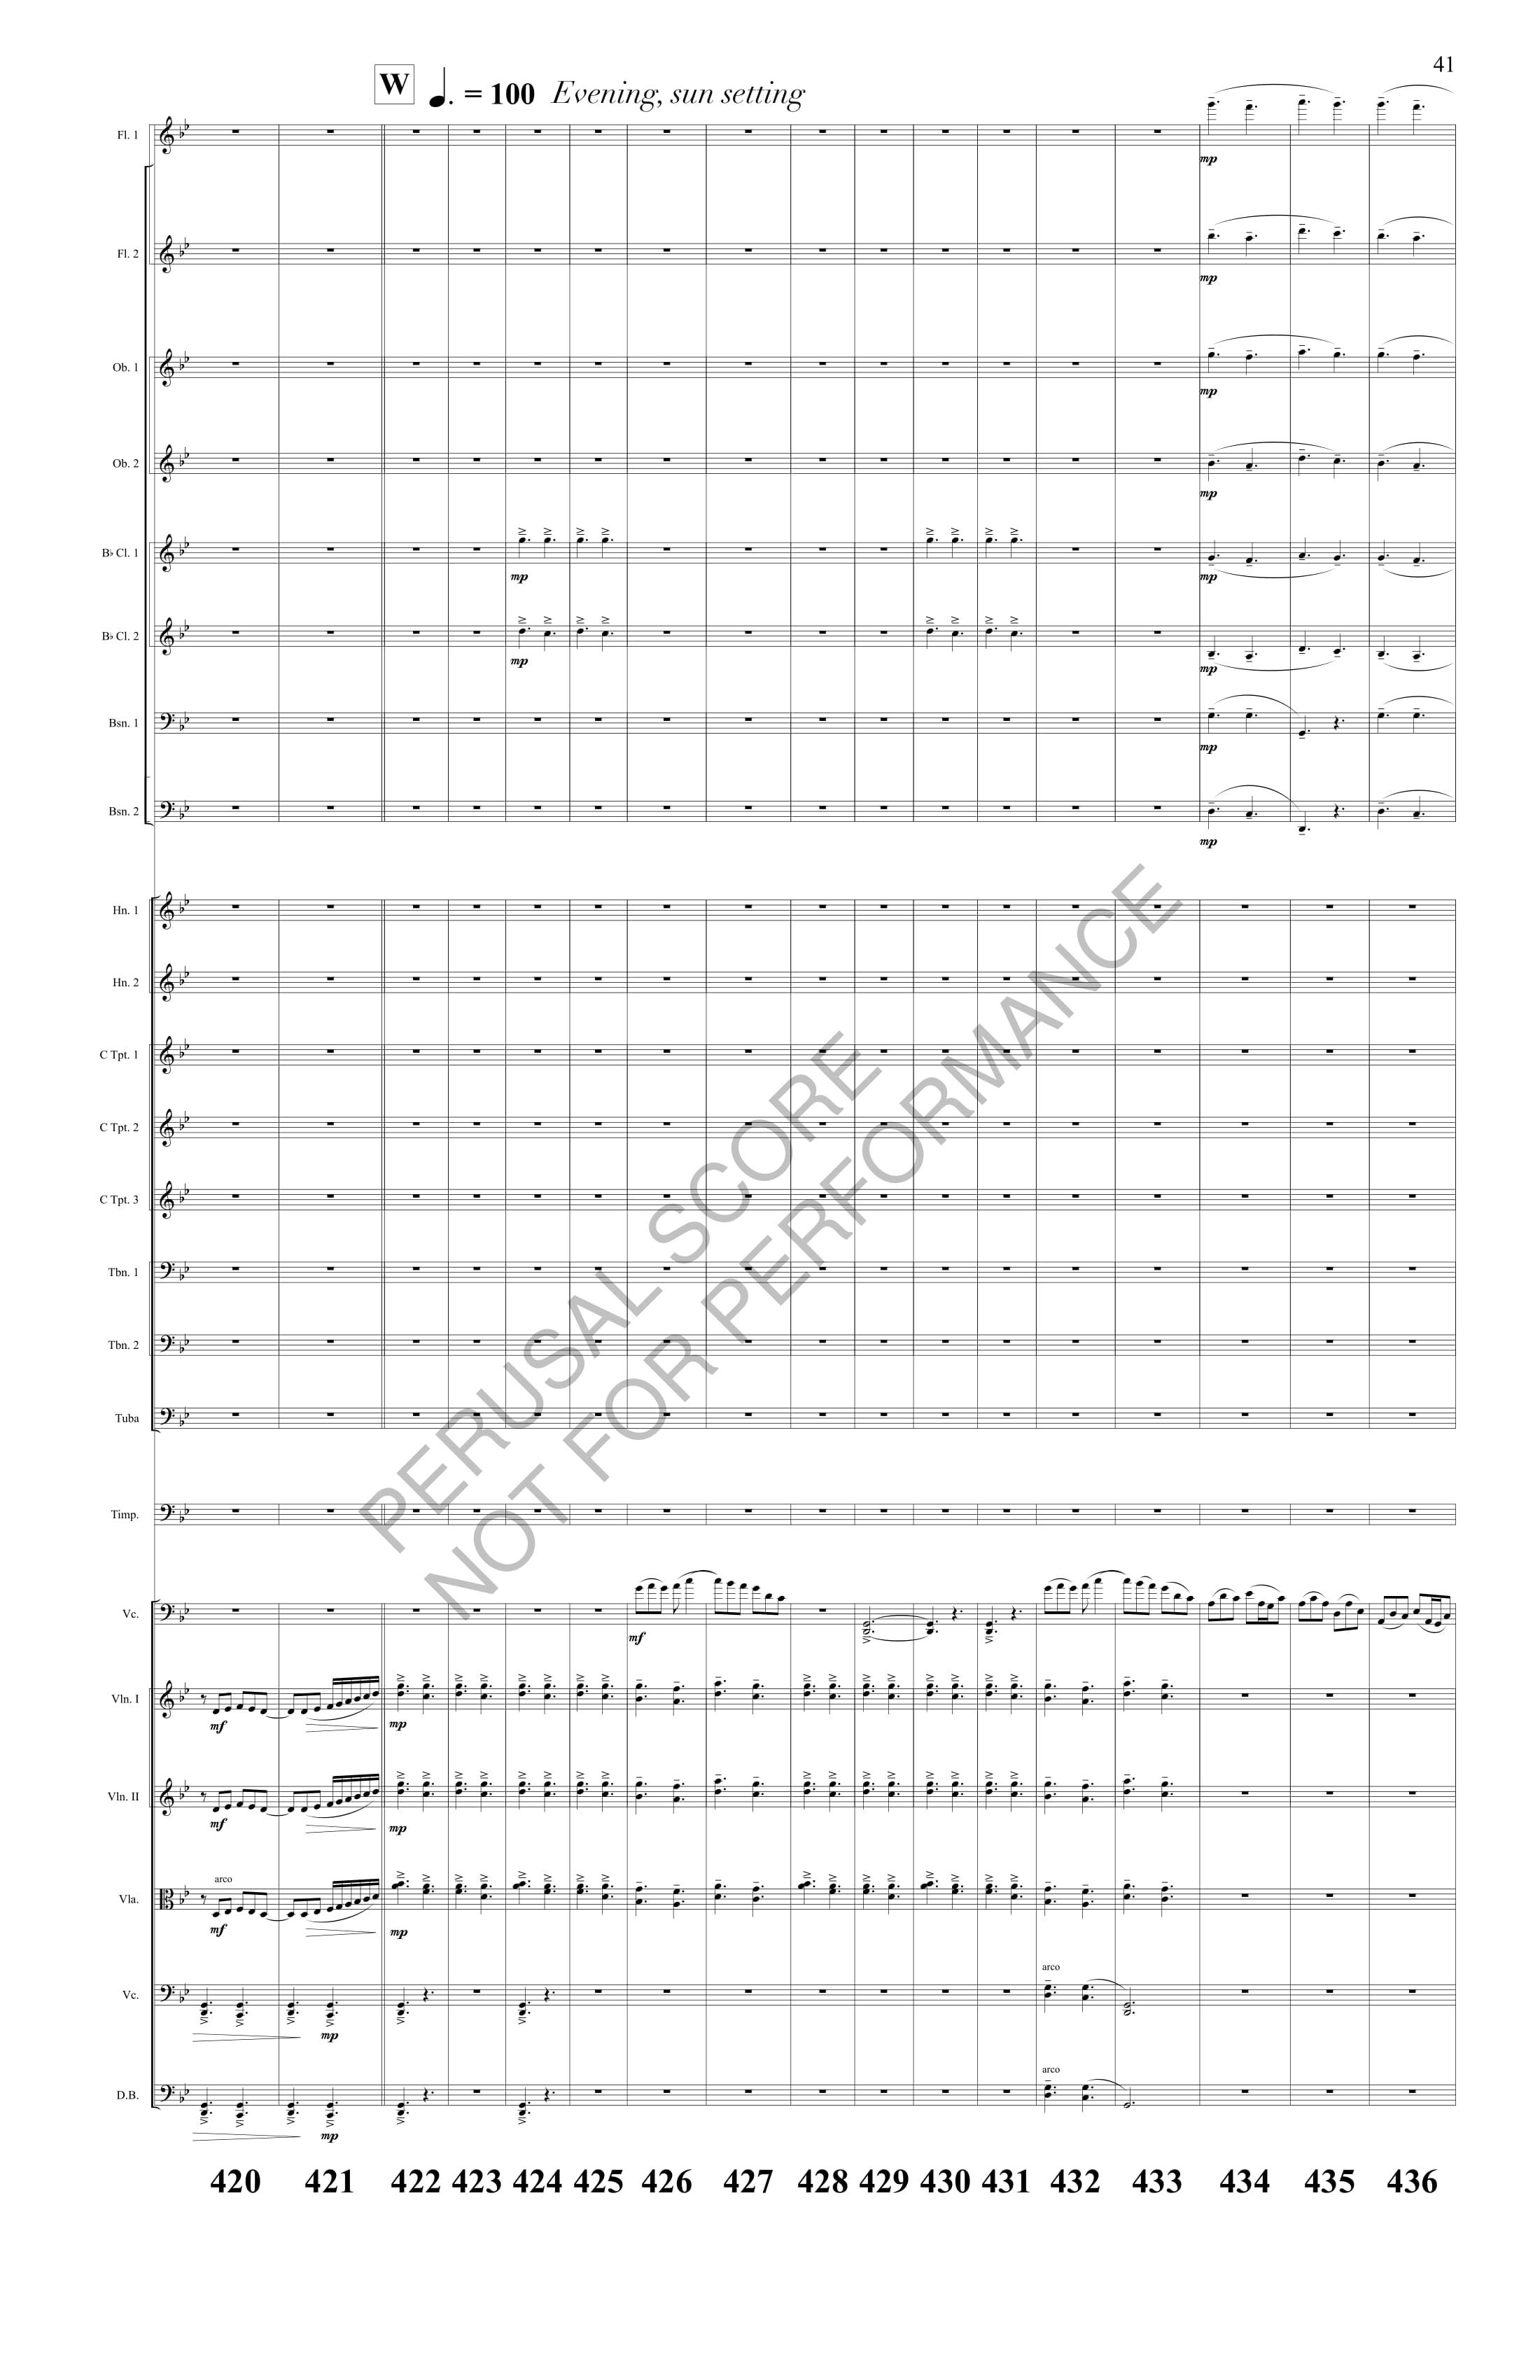 Boyd Tekton Score-watermark-47.jpg